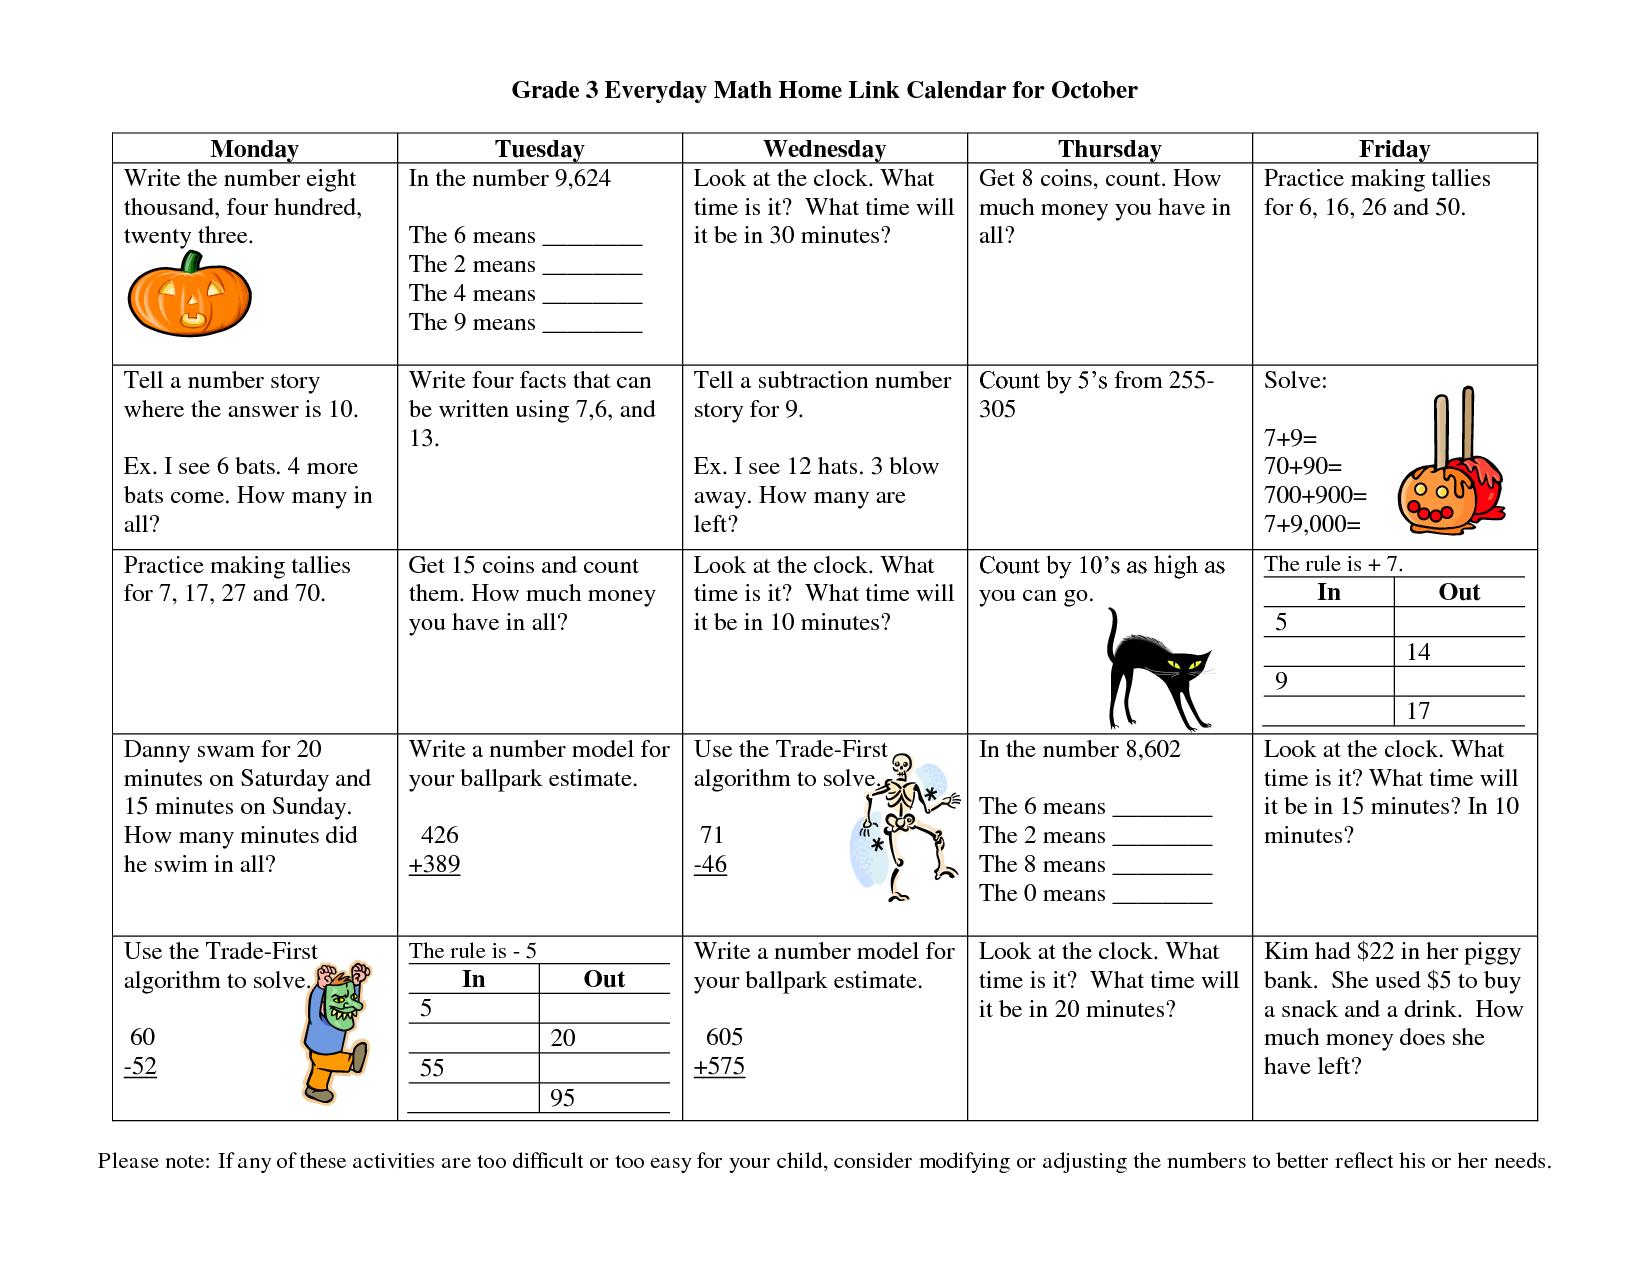 Worksheets Everyday Math Worksheets calendar math for third grade 3 everyday home link october creative teaching pinterest school